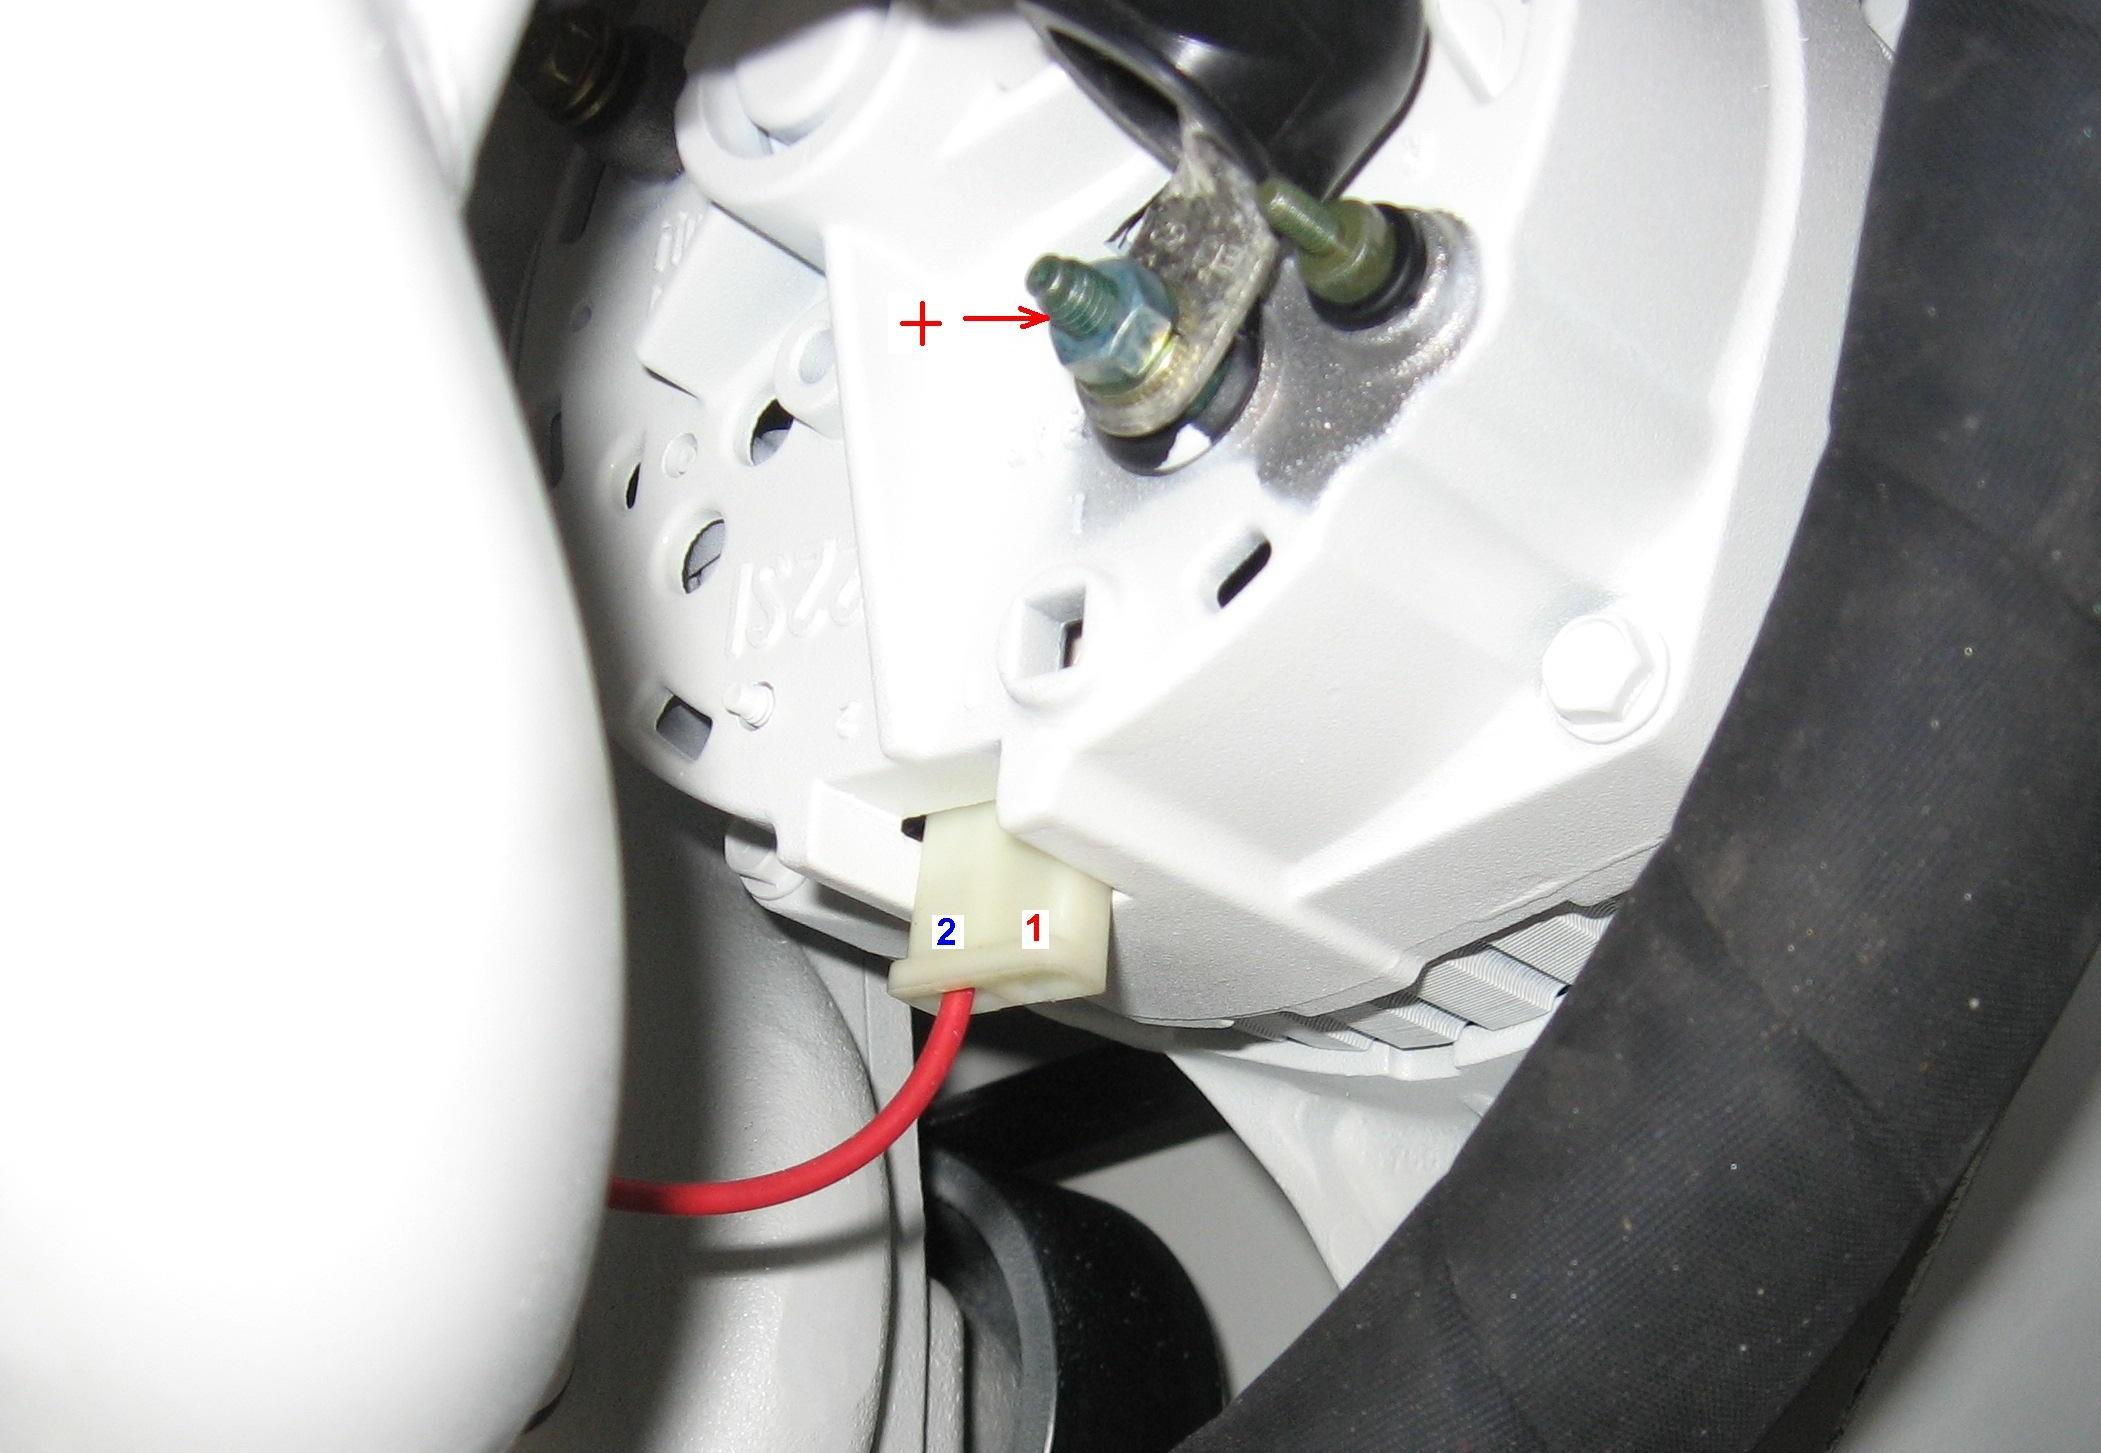 delco marine alternator wiring diagram wiring diagram and valeo marine alternator wiring diagram diagrams